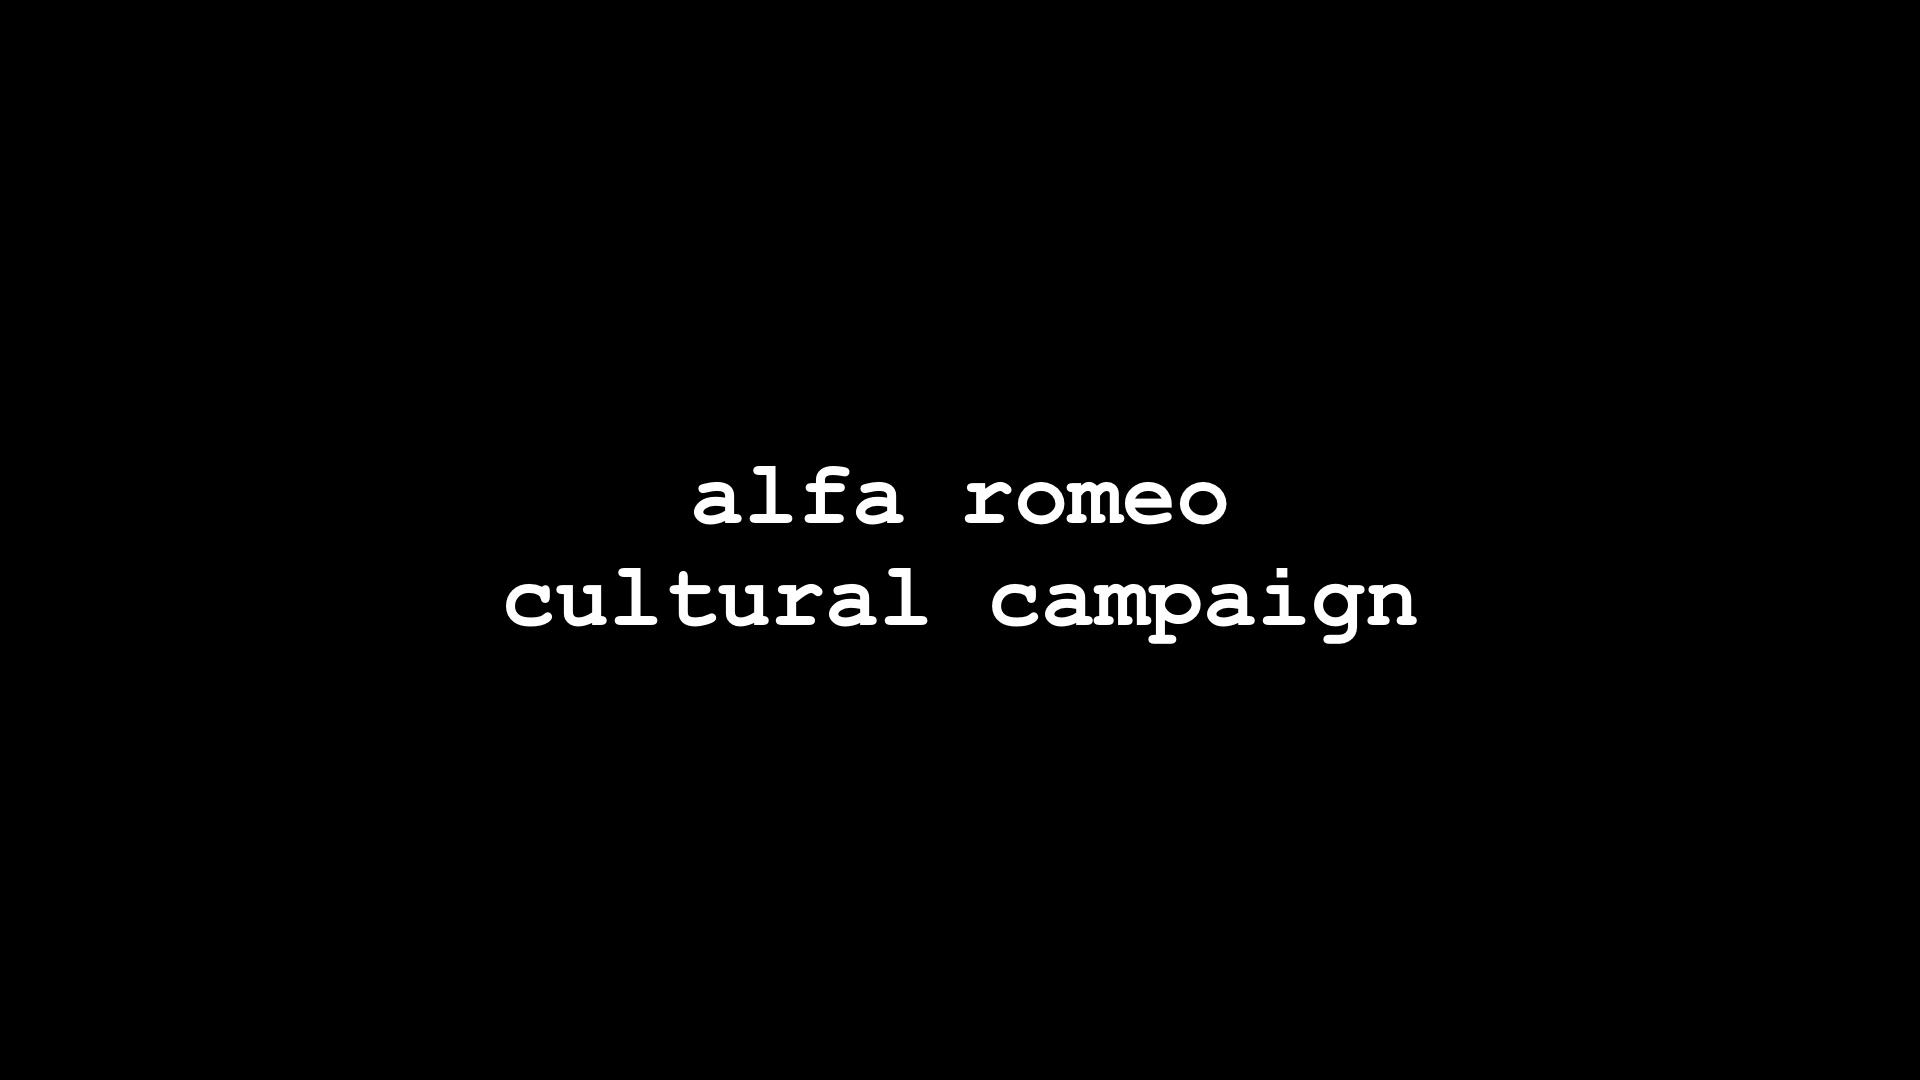 intern work  summer 2016  cultural relevance, campaign, deck design